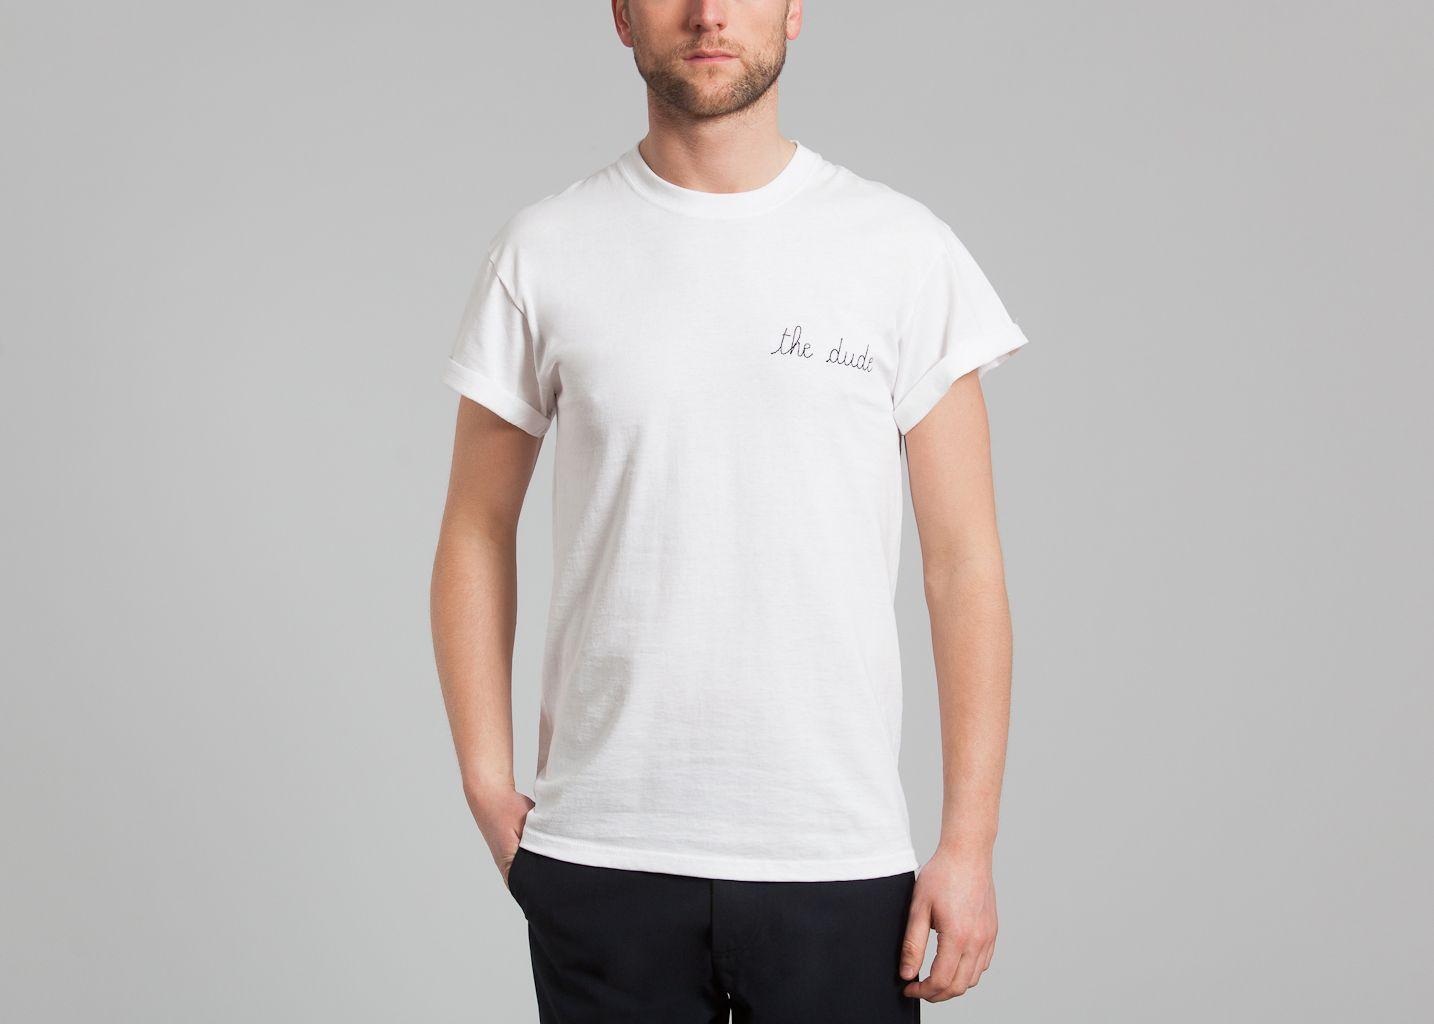 Tshirt The Dude - Maison Labiche